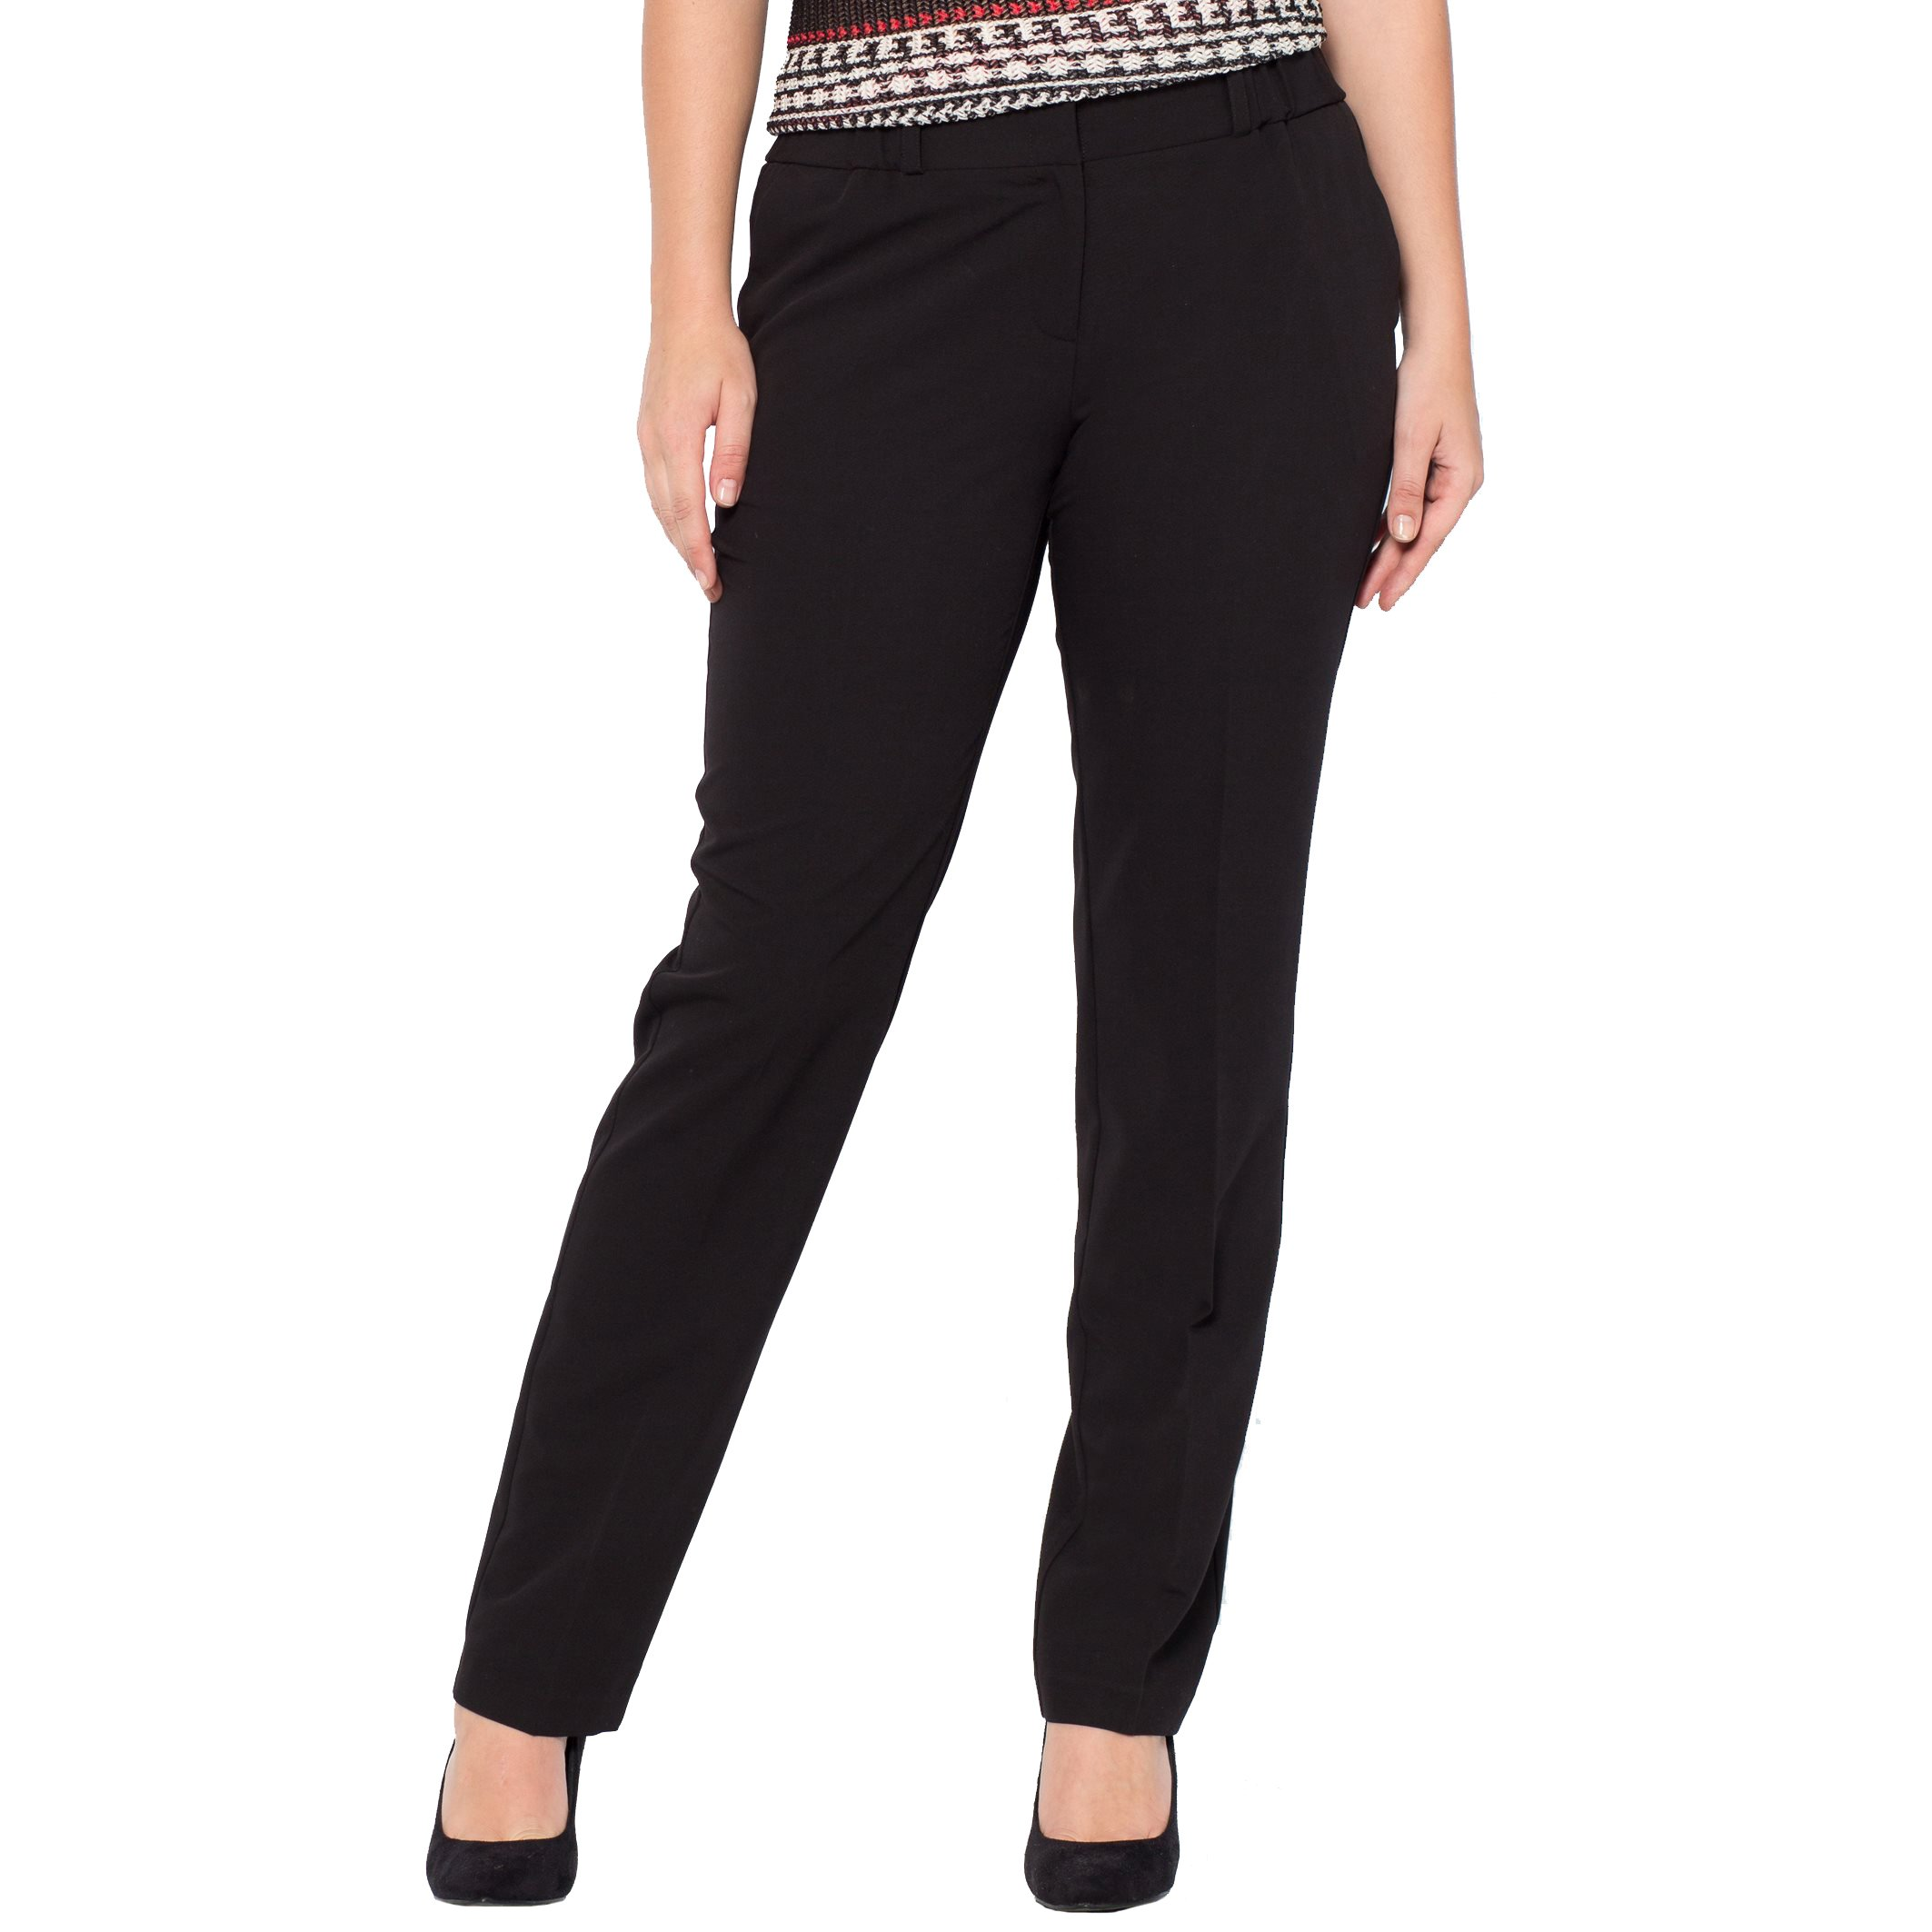 La Redoute Castaluna Womens Peg Trousers with Elasticated Waist Black Size US 18 - FR 48